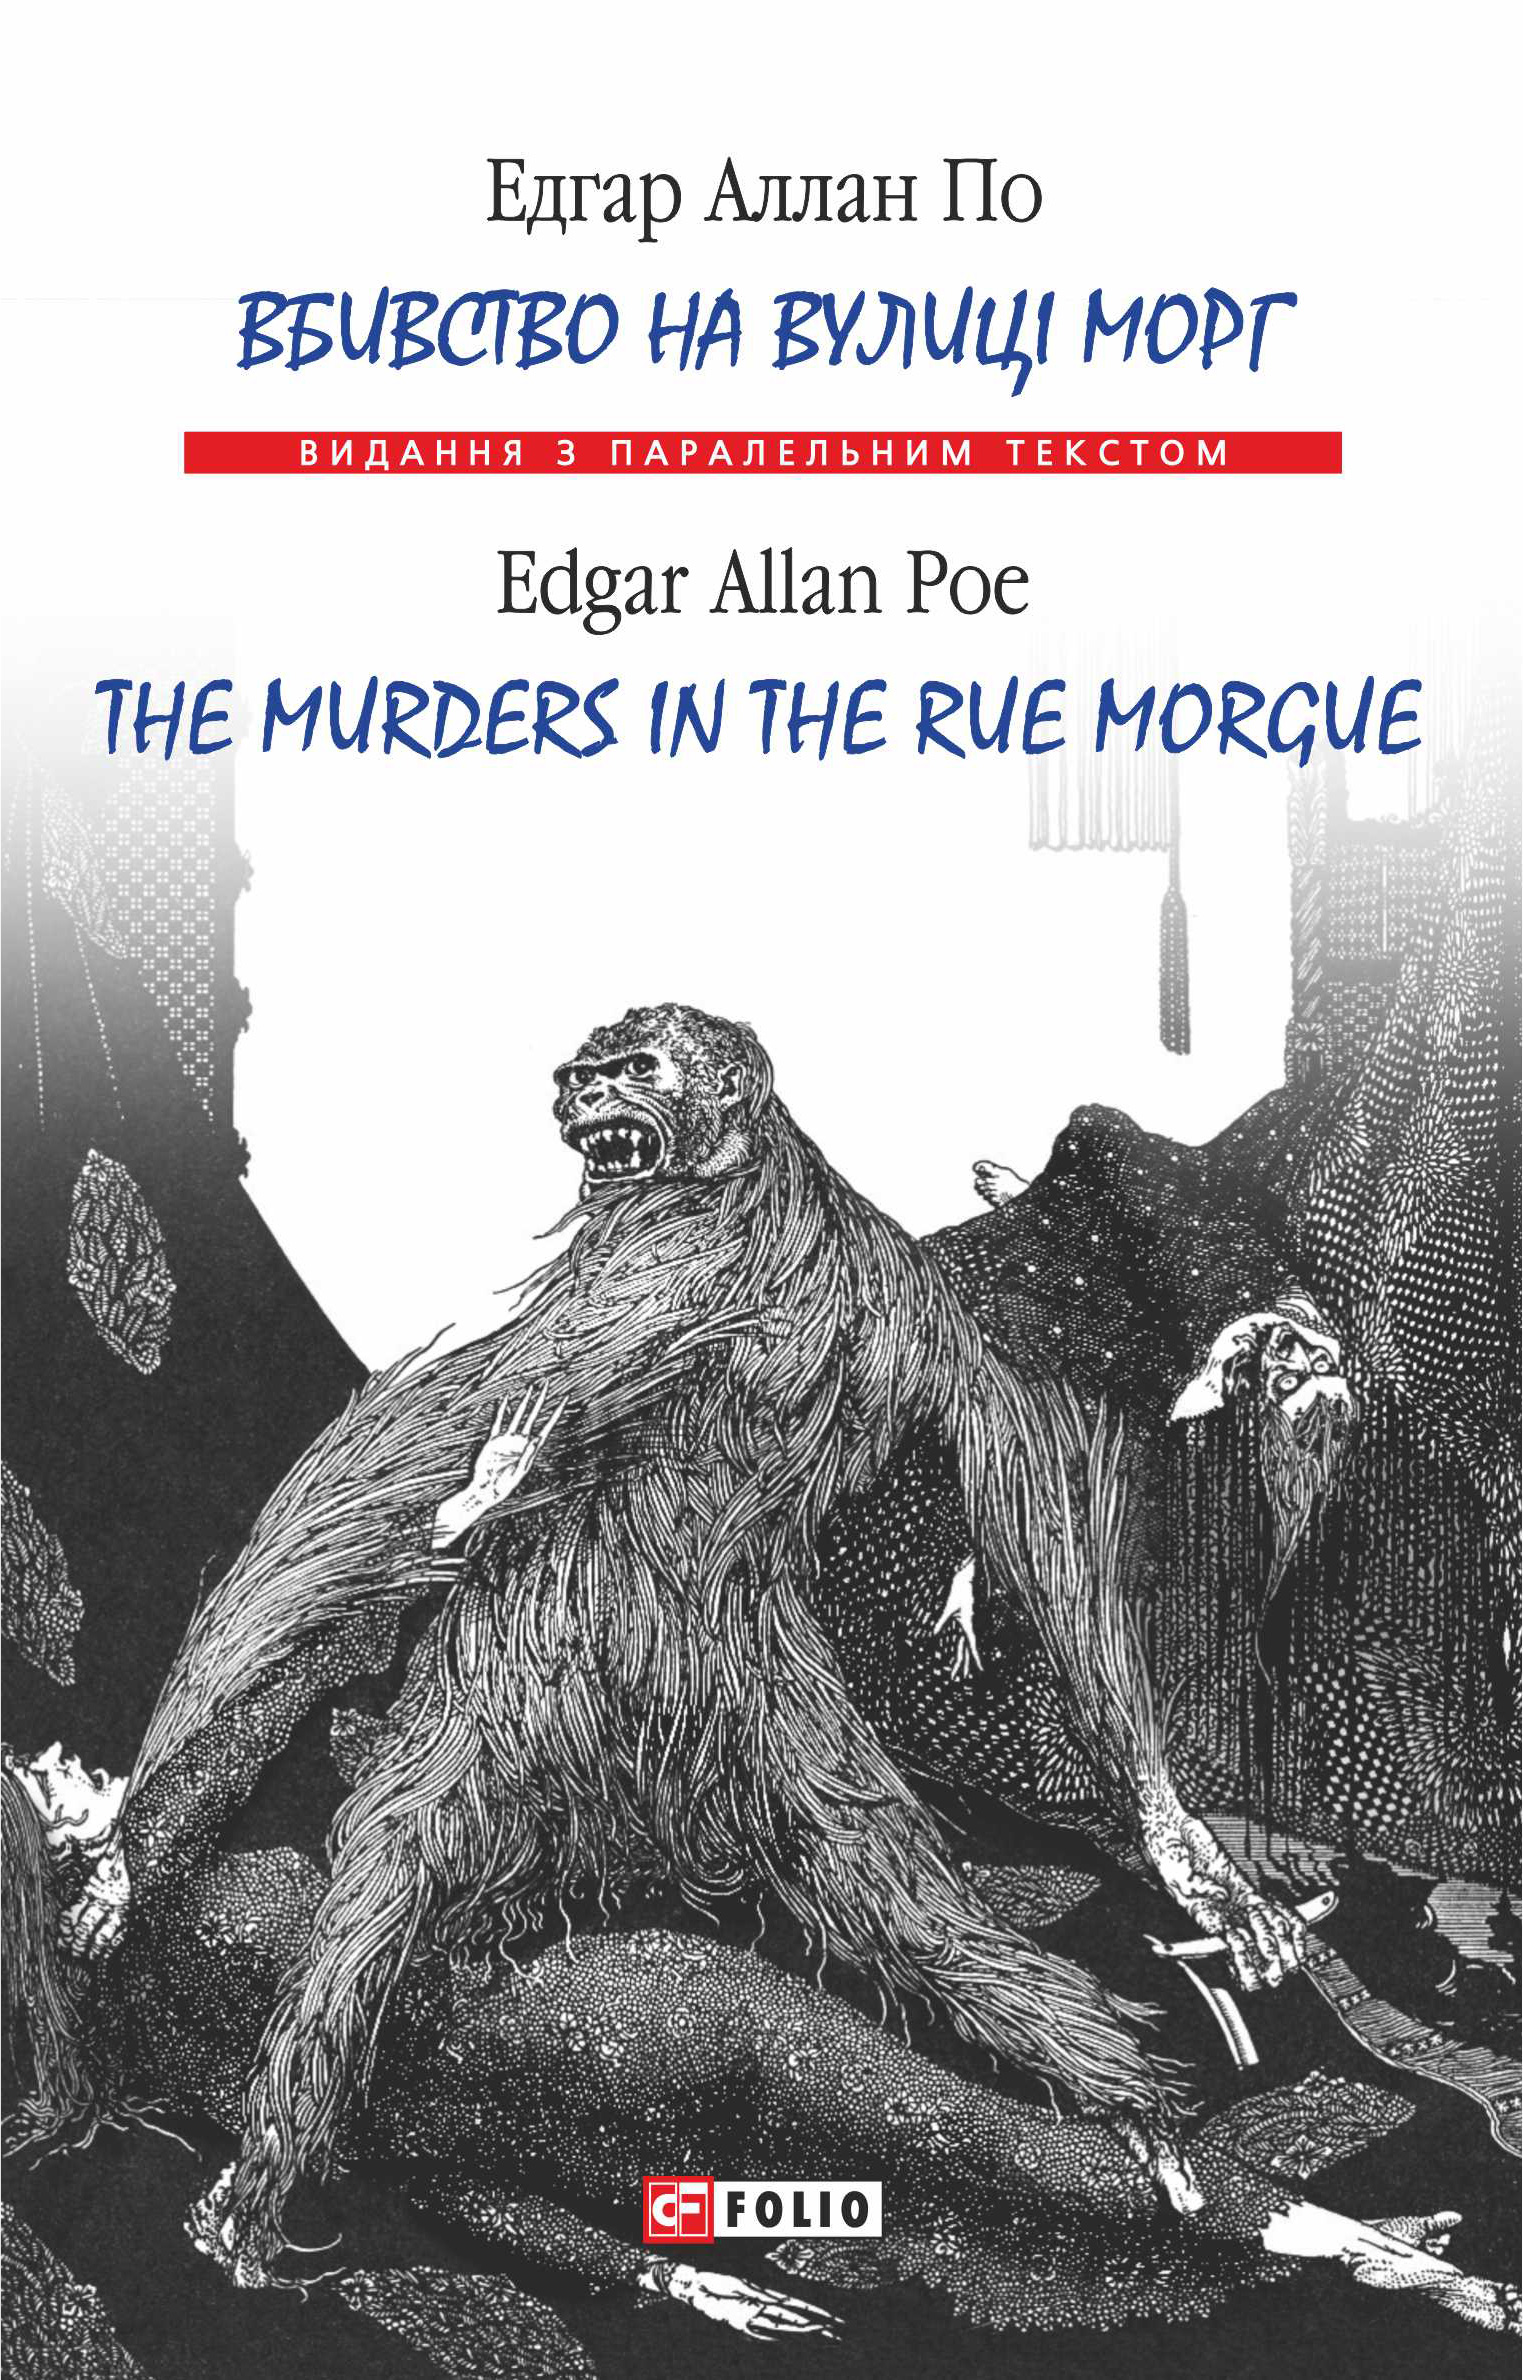 Едгар Аллан По Вбивство на вулиці Морг = The murders in the rue Morgue эдгар аллан по the murders in the rue morgue